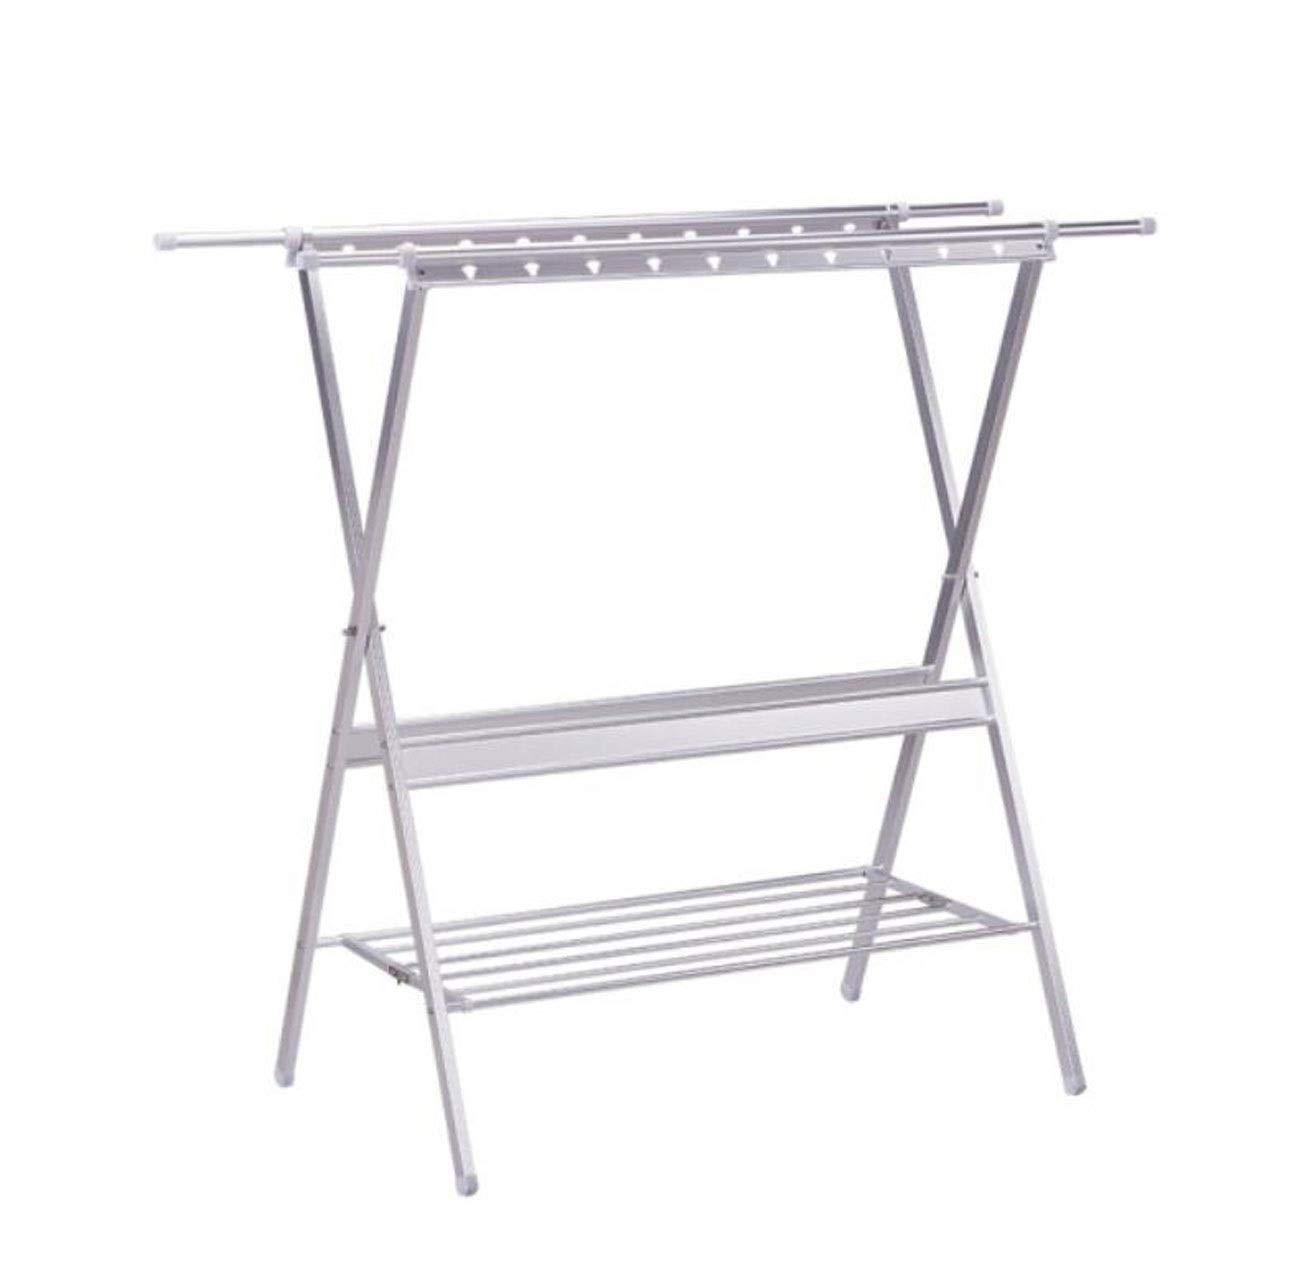 HYZLYJ Drying Rack, Aluminum Alloy X-Type Indoor Drying Rack Simple Folding Floor Telescopic Double Pole Balcony Drying Quilt Rack (Color : C)